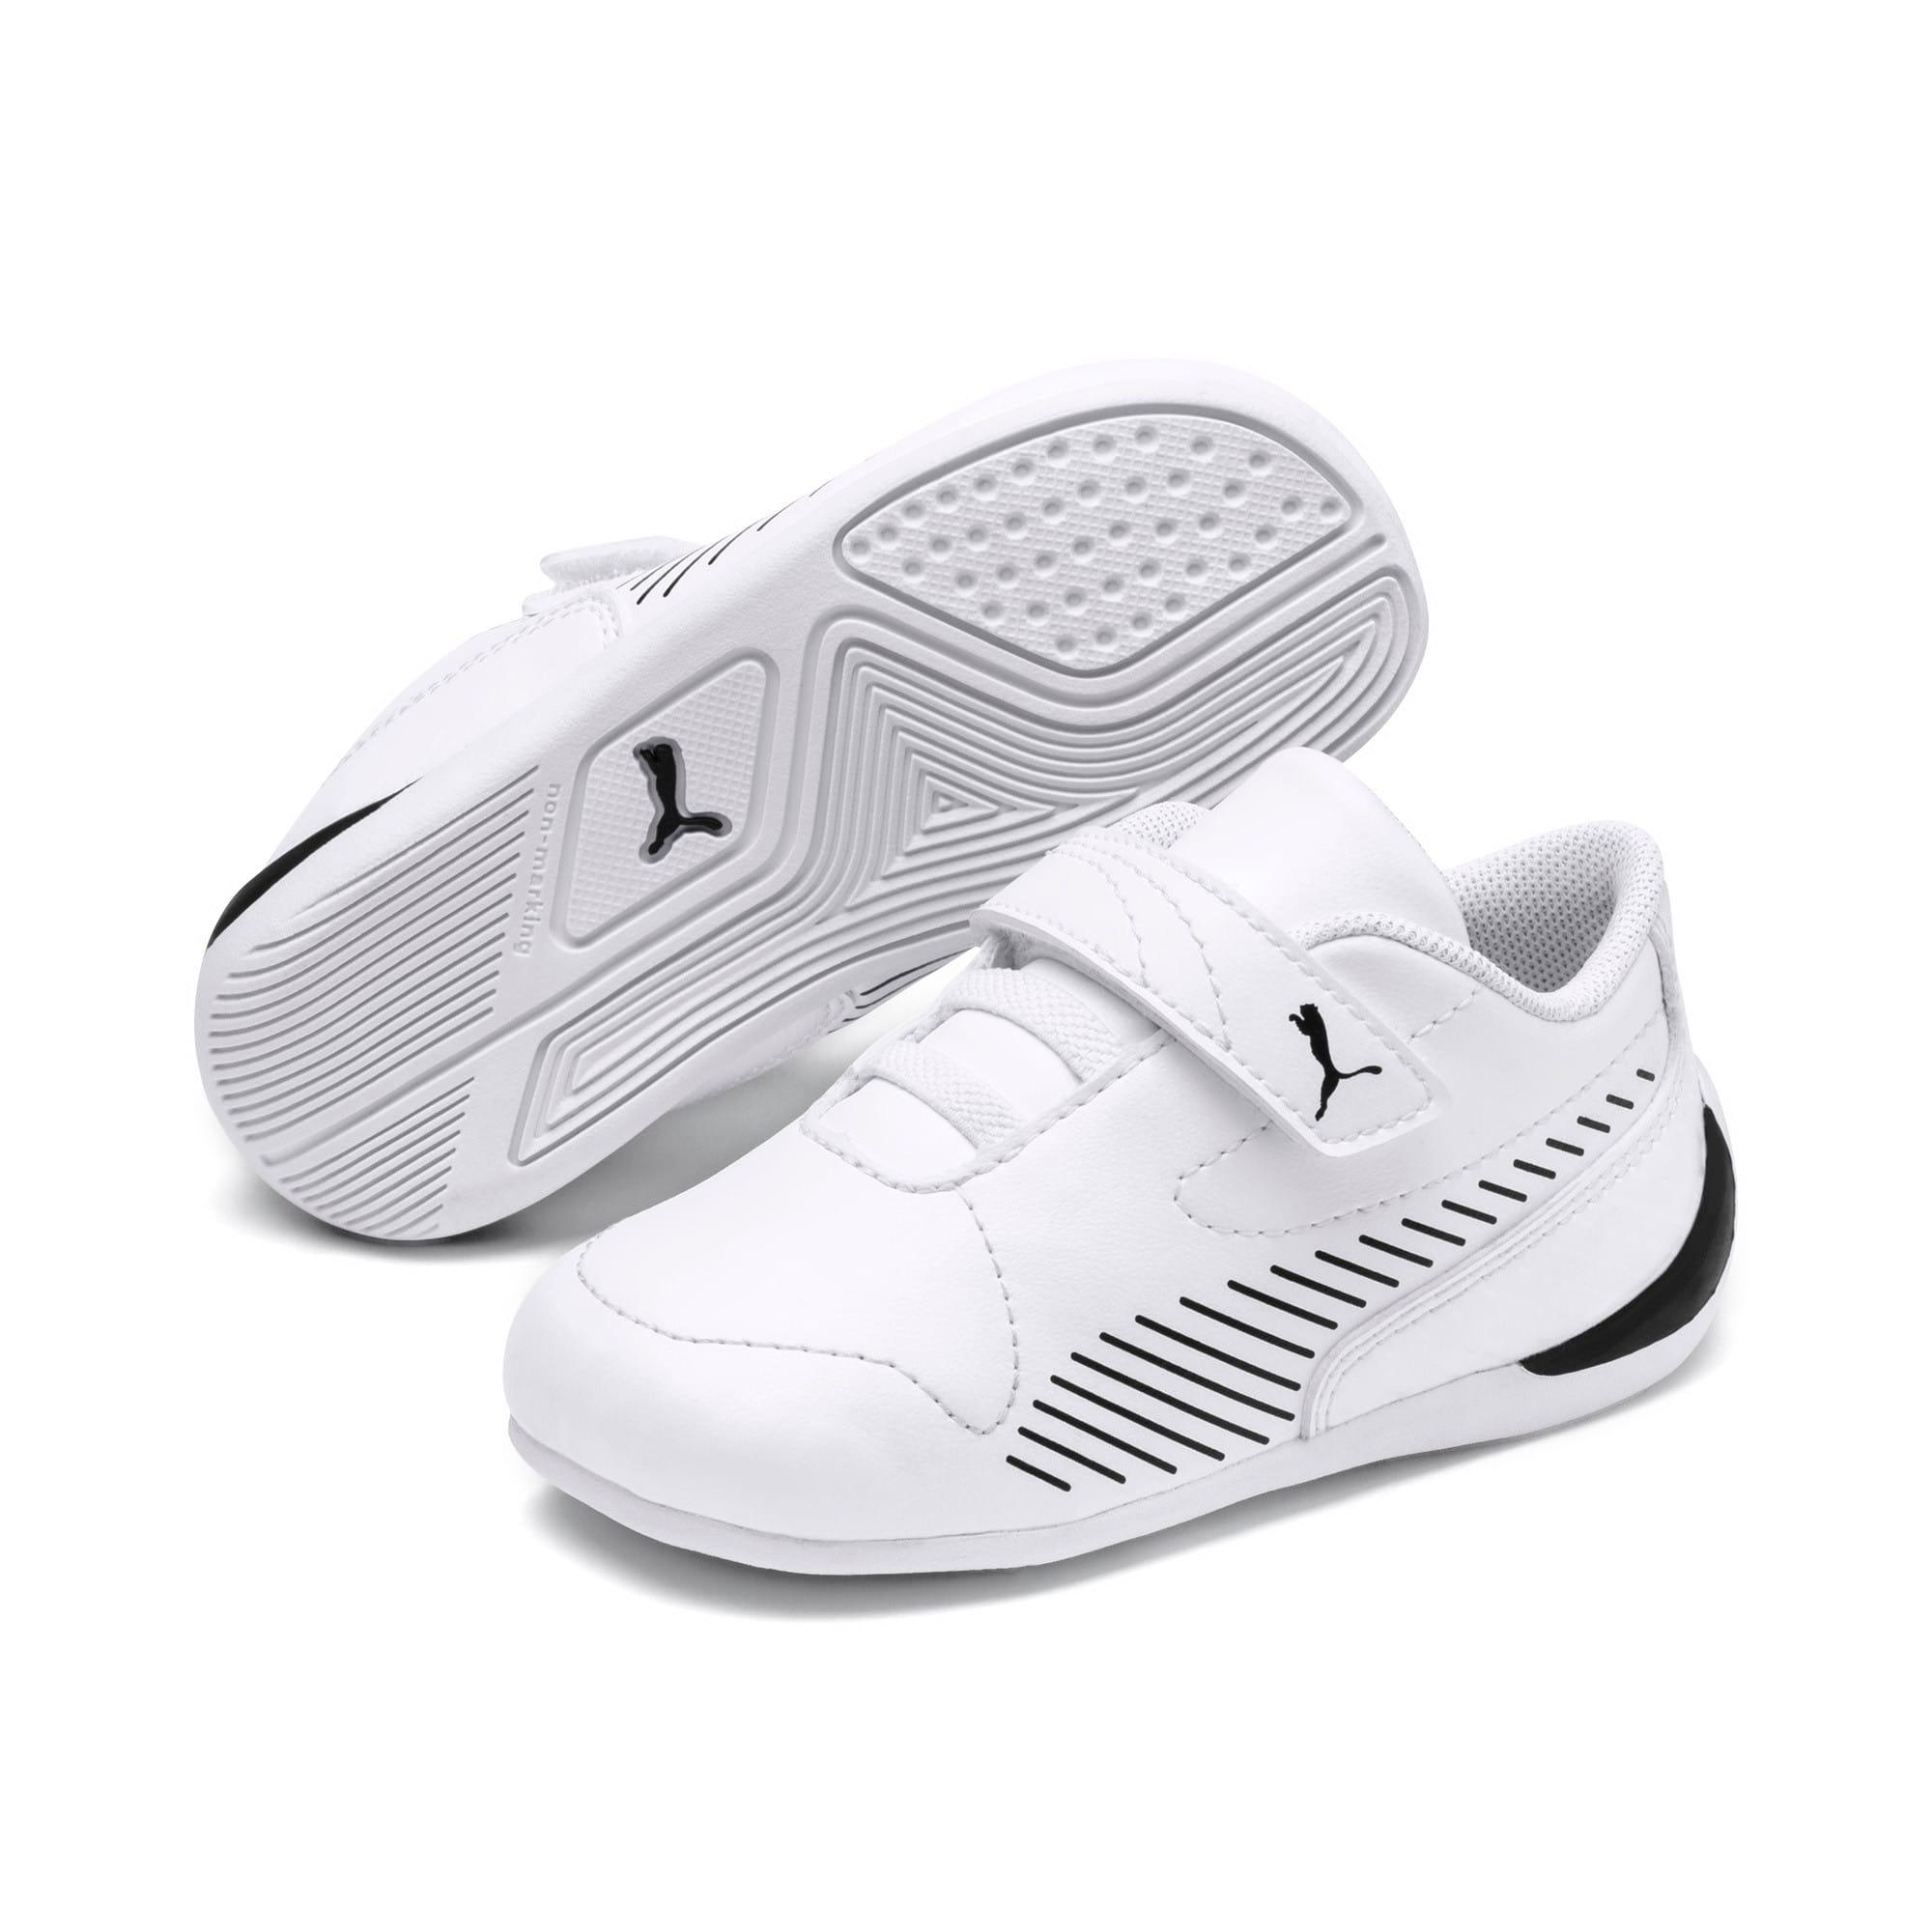 Thumbnail 2 of Ferrari Drift Cat 7S Ultra Kids Sneaker, Puma White-Puma Black, medium